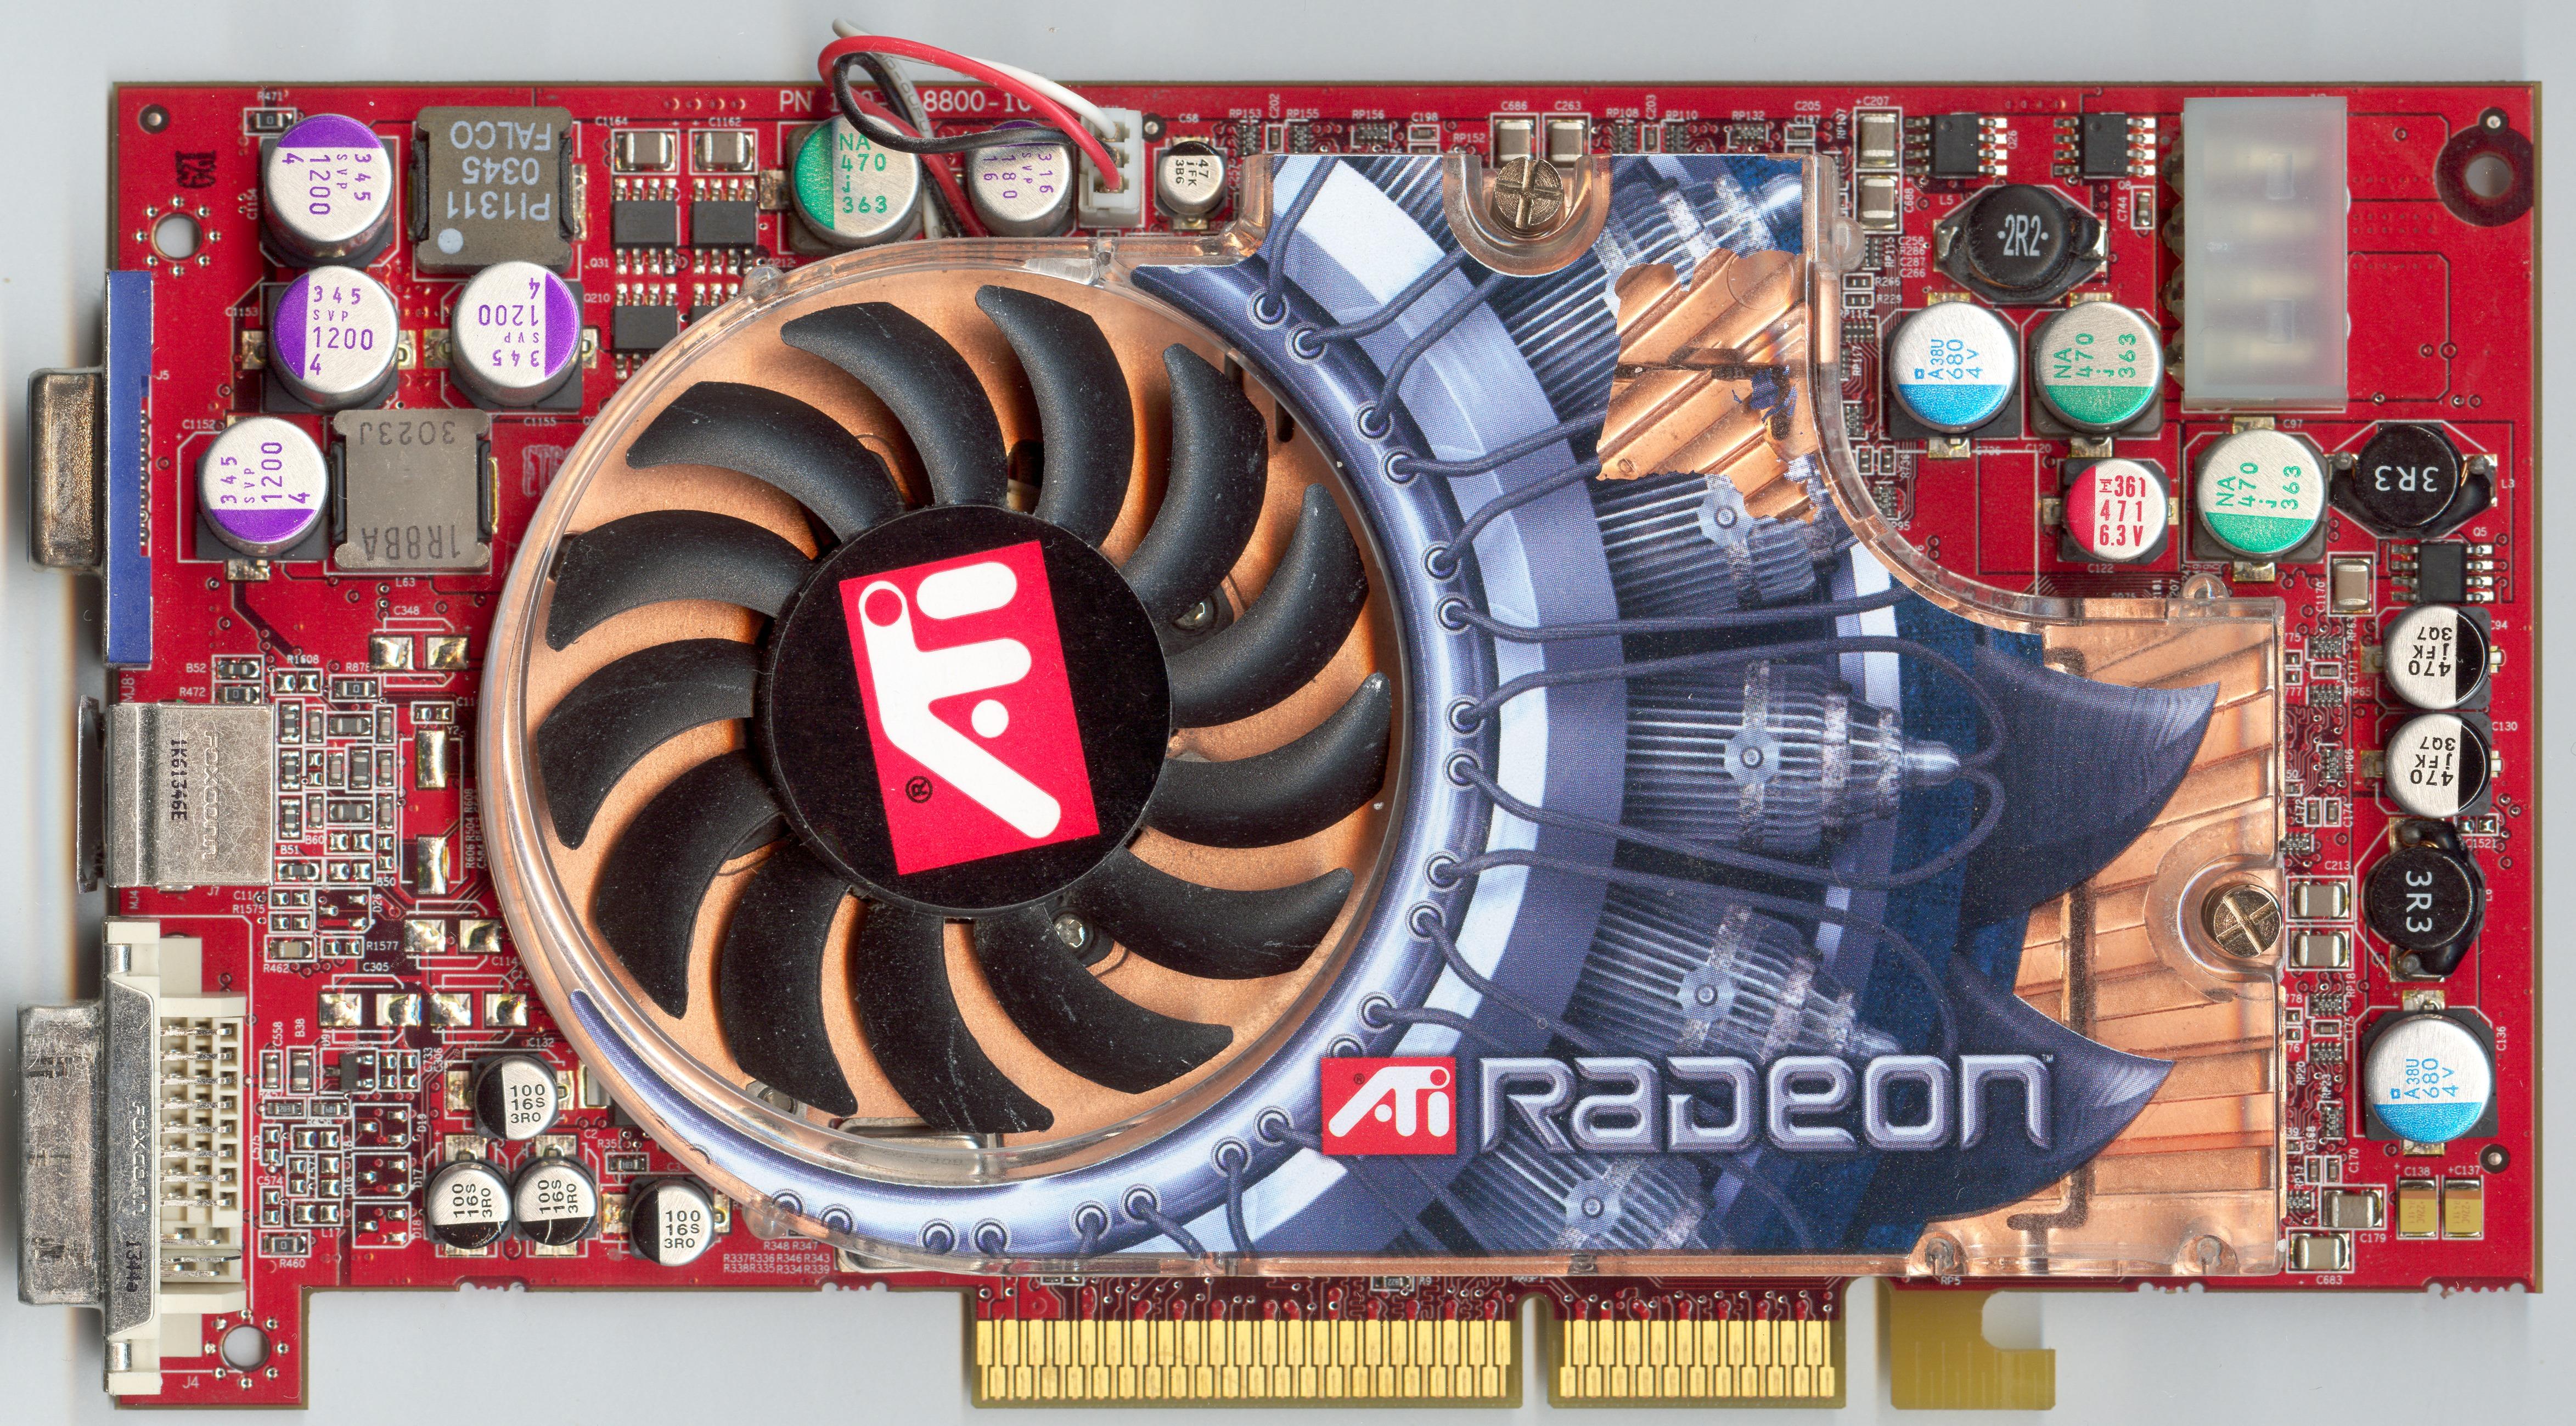 ATi Radeon 9800 XT Front Side